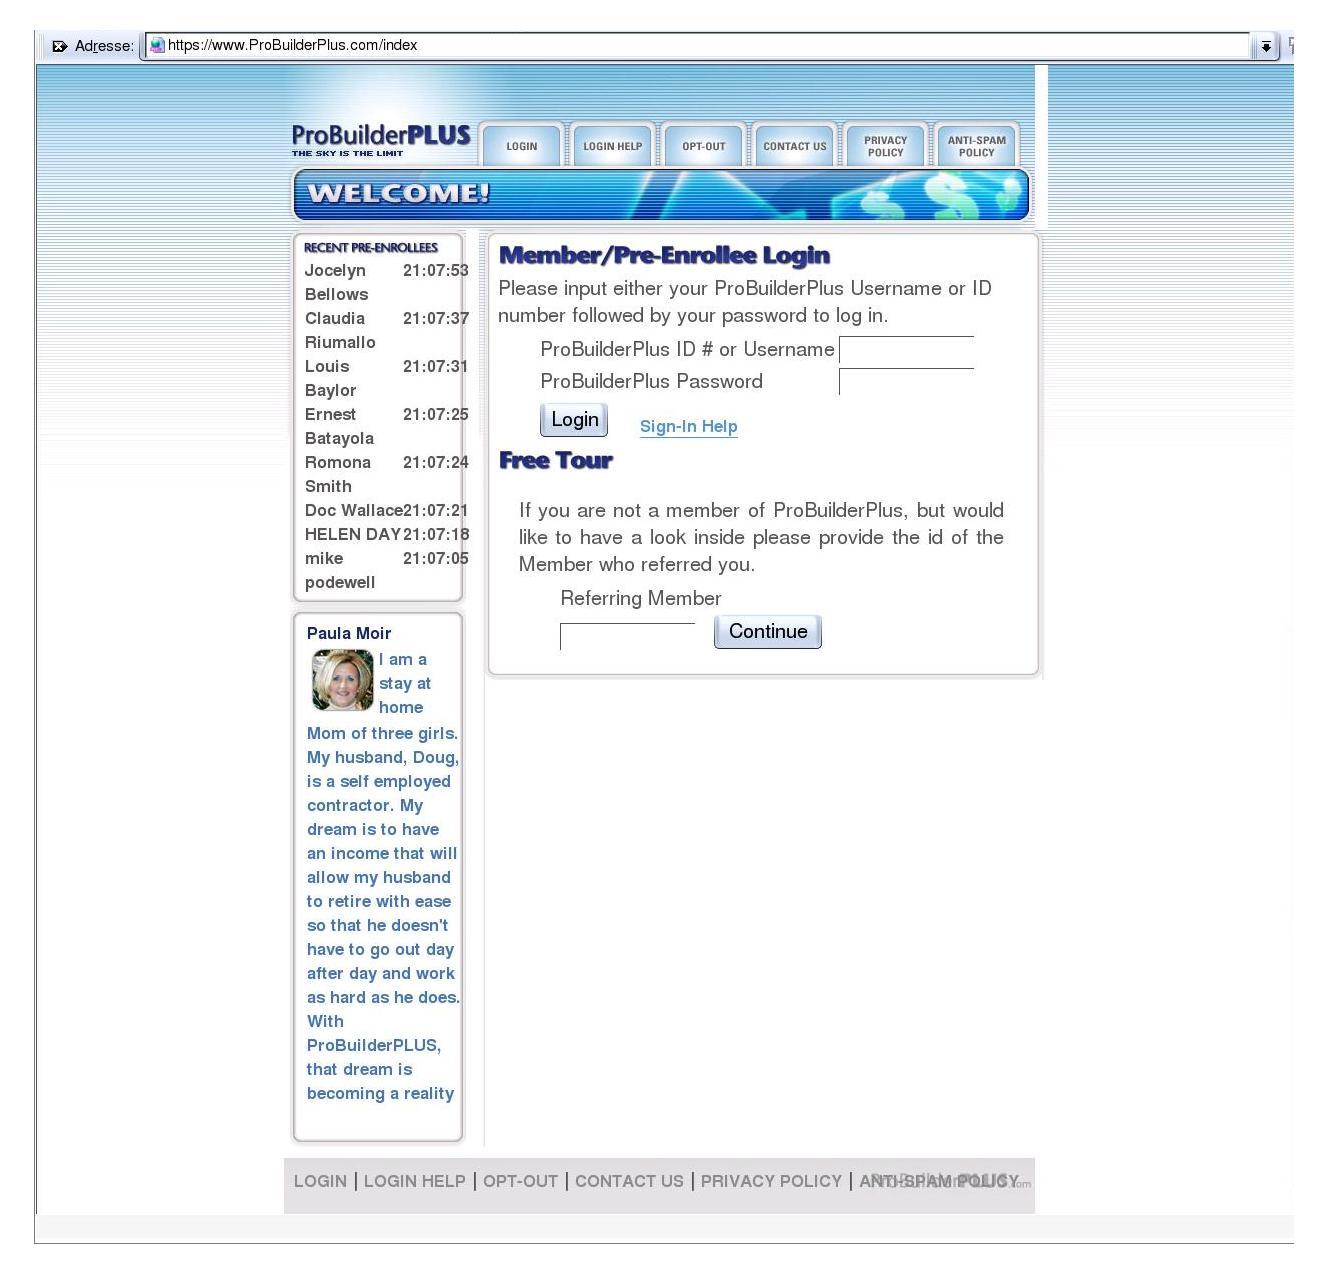 df7588aeb Wehrhafte Medizin!, MLM: Menschenmuehle ProBuilderPlus.com,  http://www.ariplex.com/ama/ama_nu21.htm